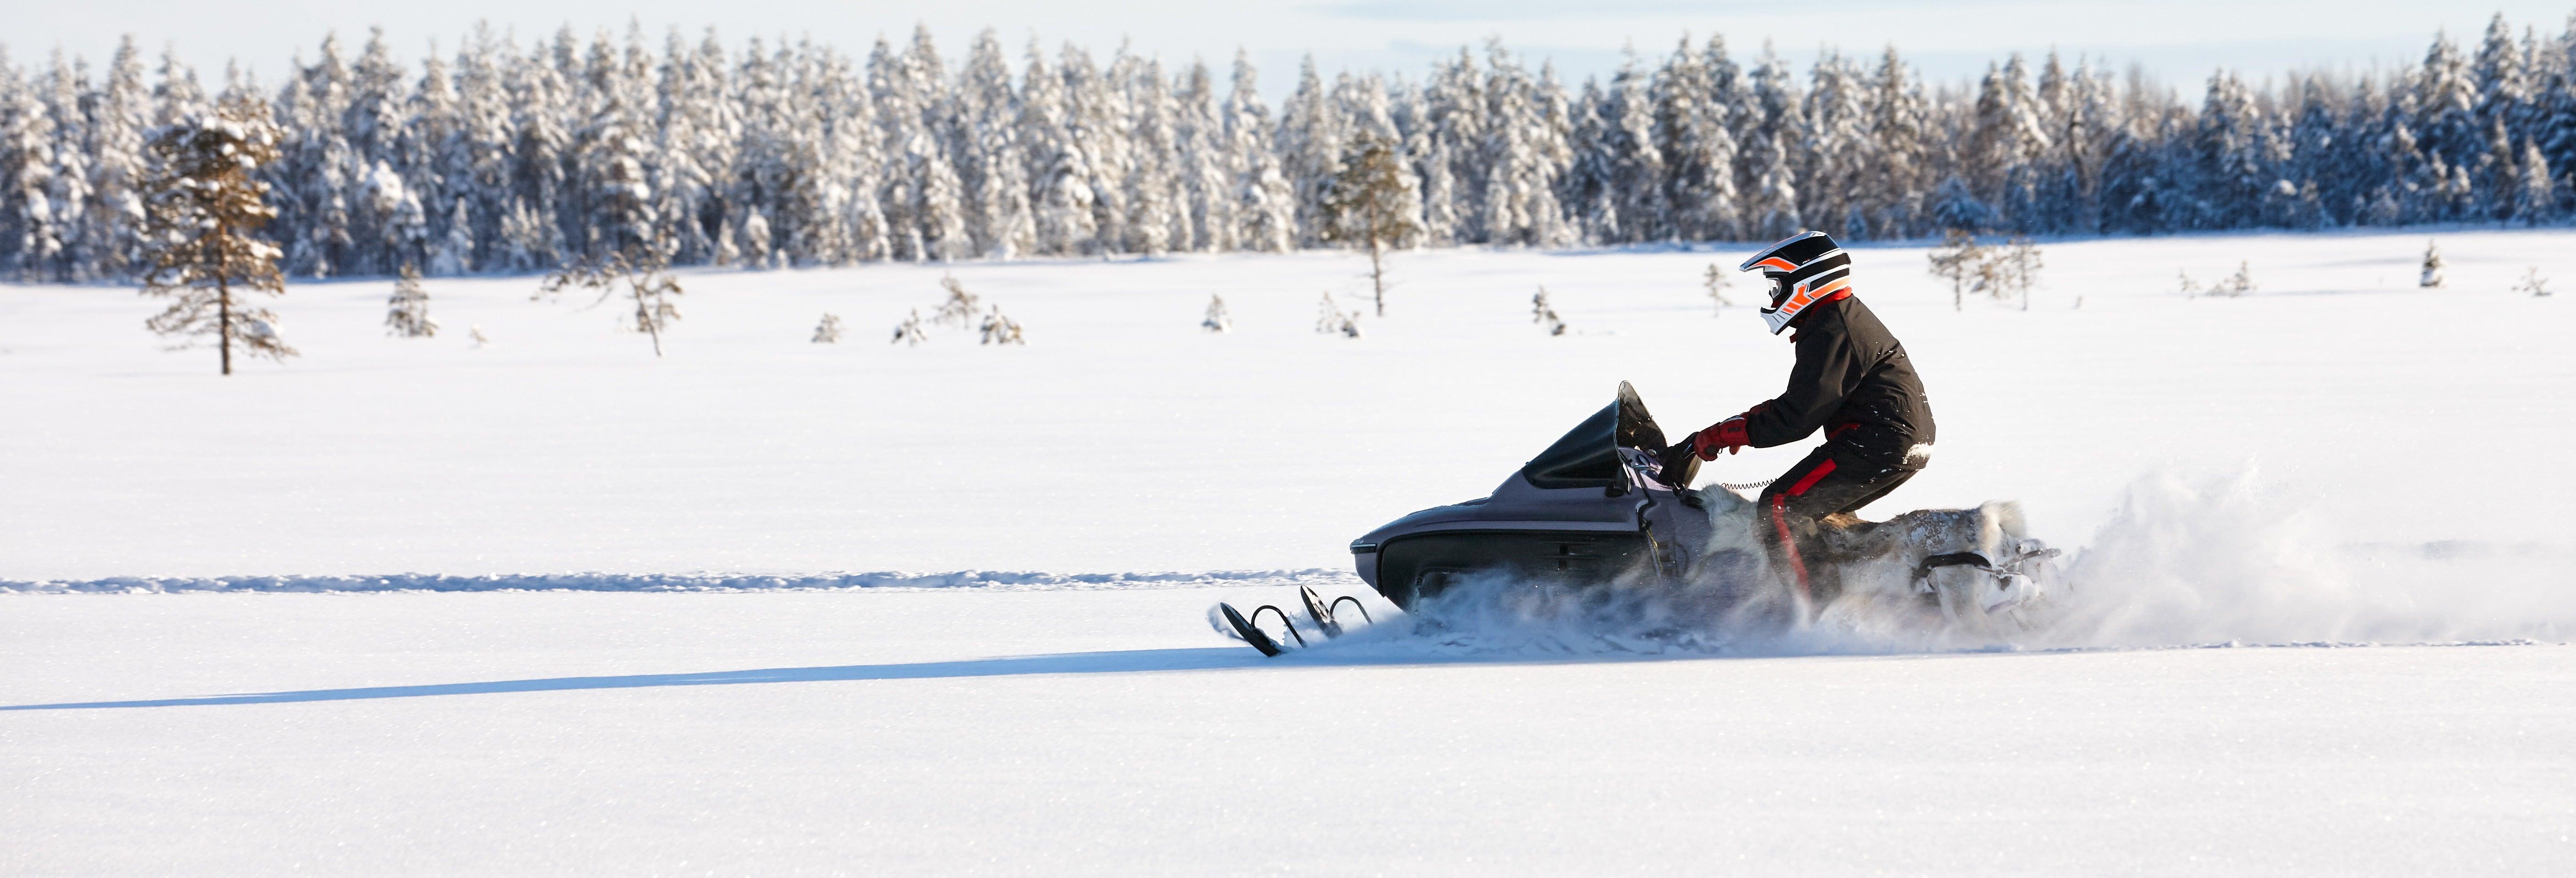 Balade en moteneige à Fairbanks